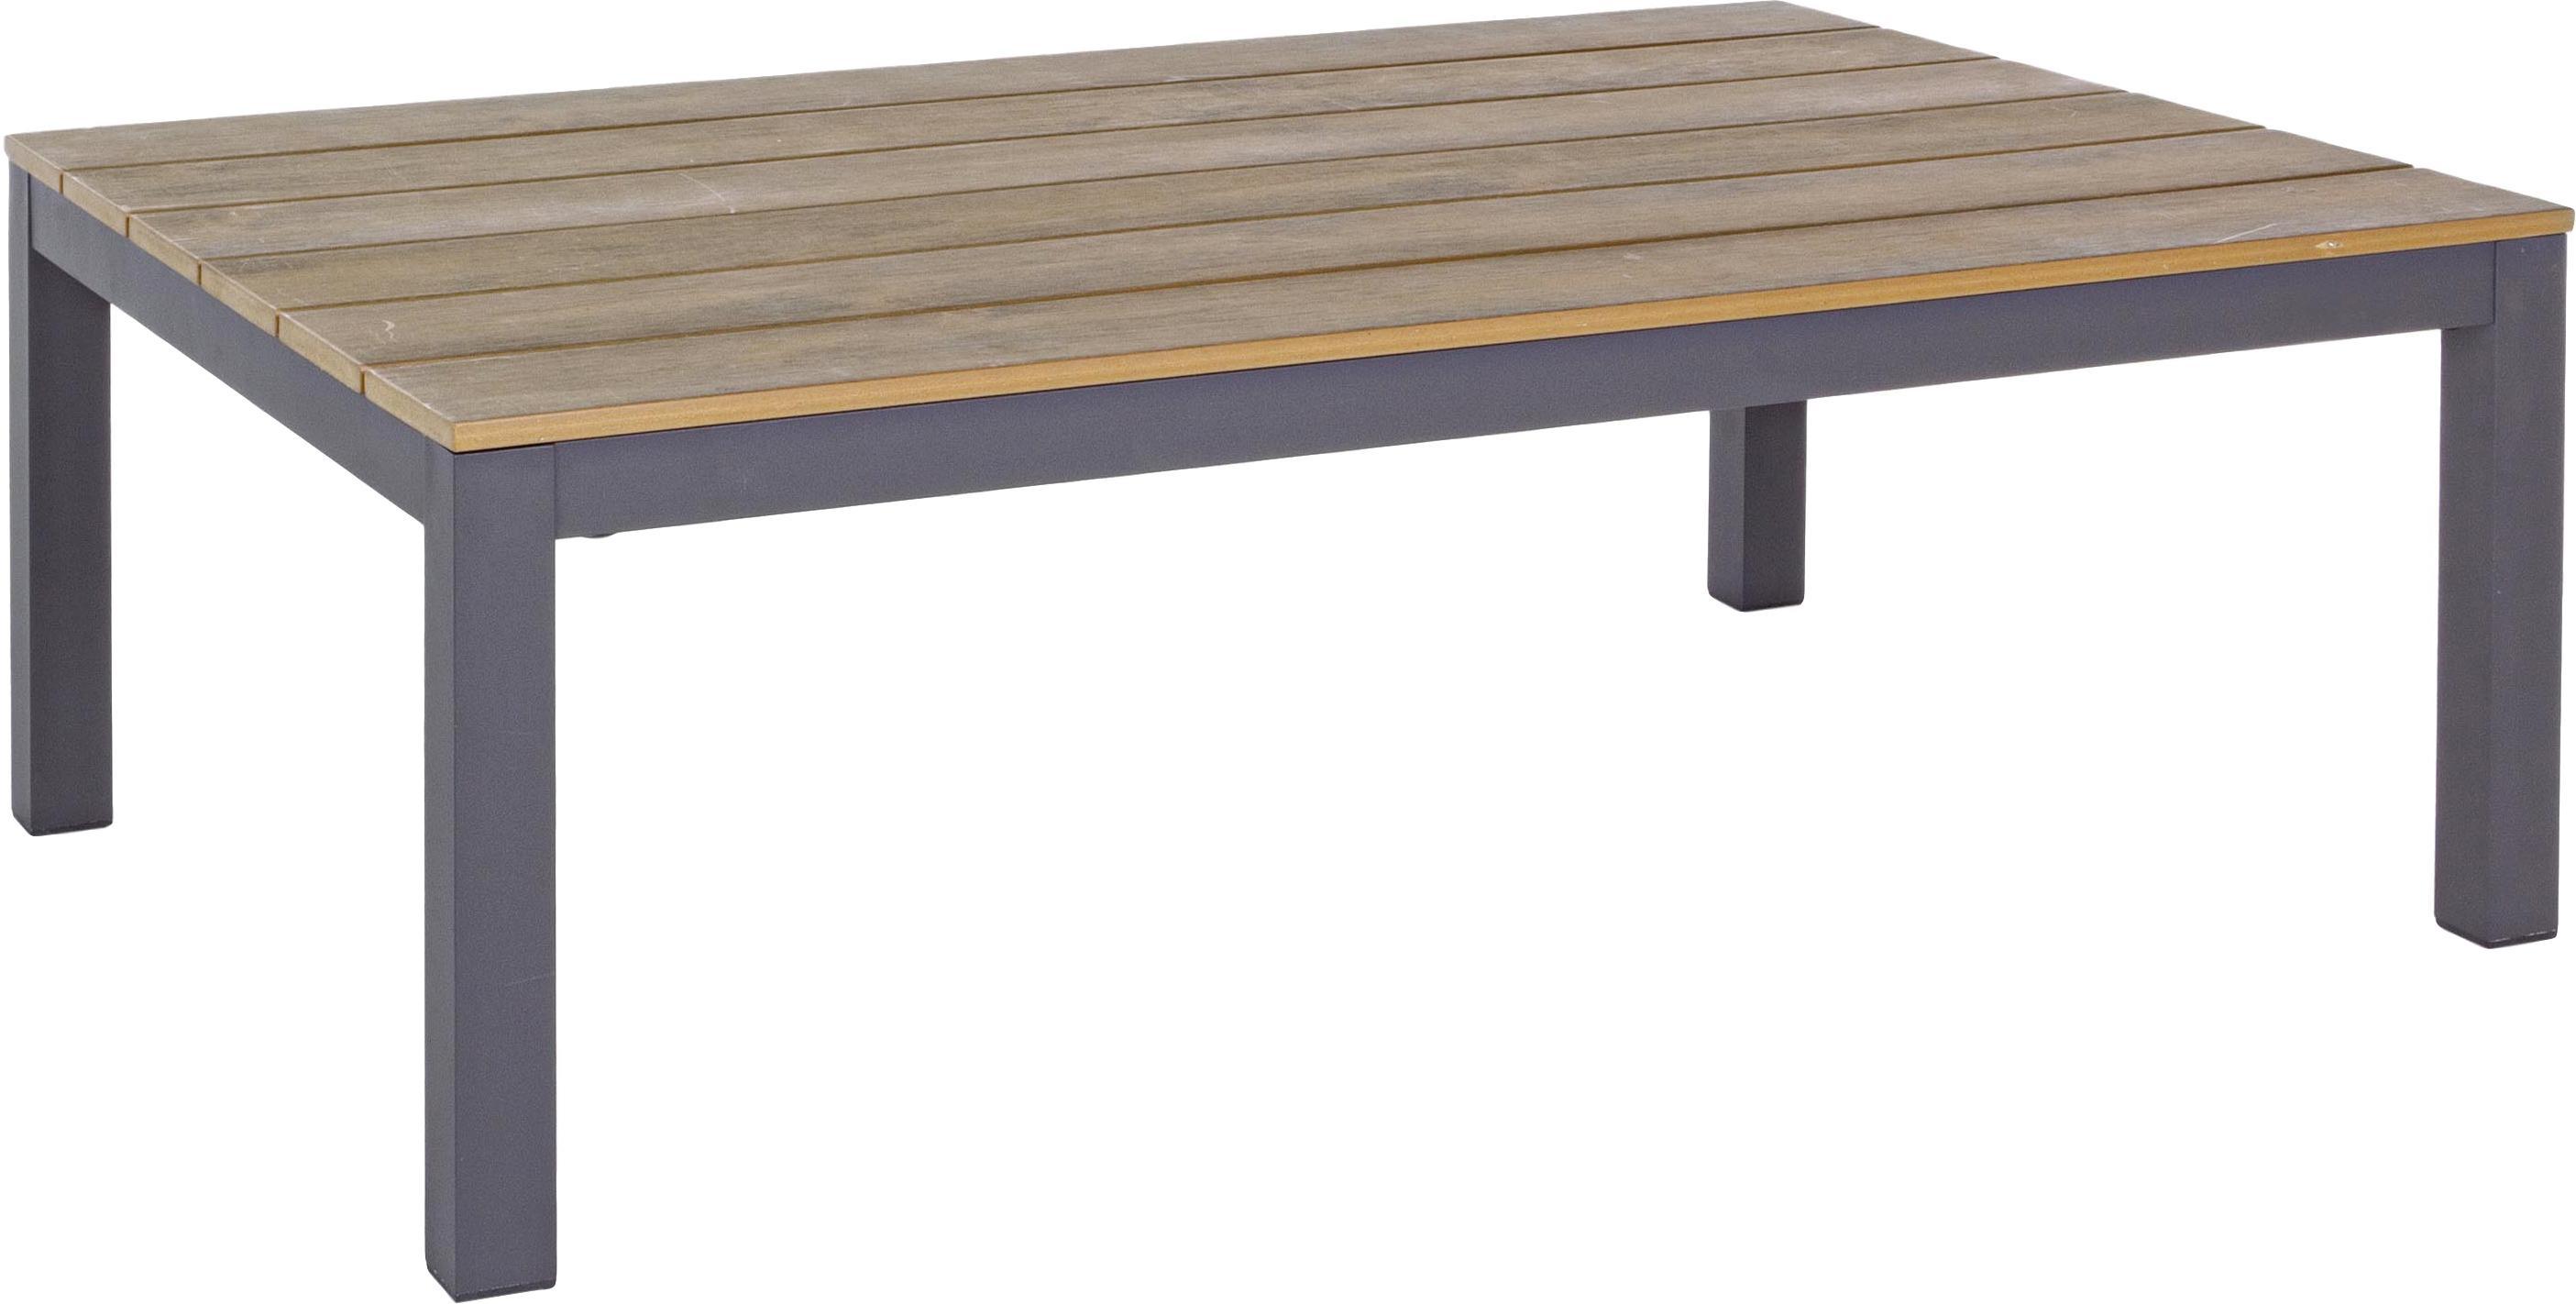 Tuin loungeset Elias, 4-delig, Frame: gepoedercoat en corrosieb, Plateaus: kunststof in hout-optiek, Crèmekleurig, antraciet, B 246  x D 246 cm